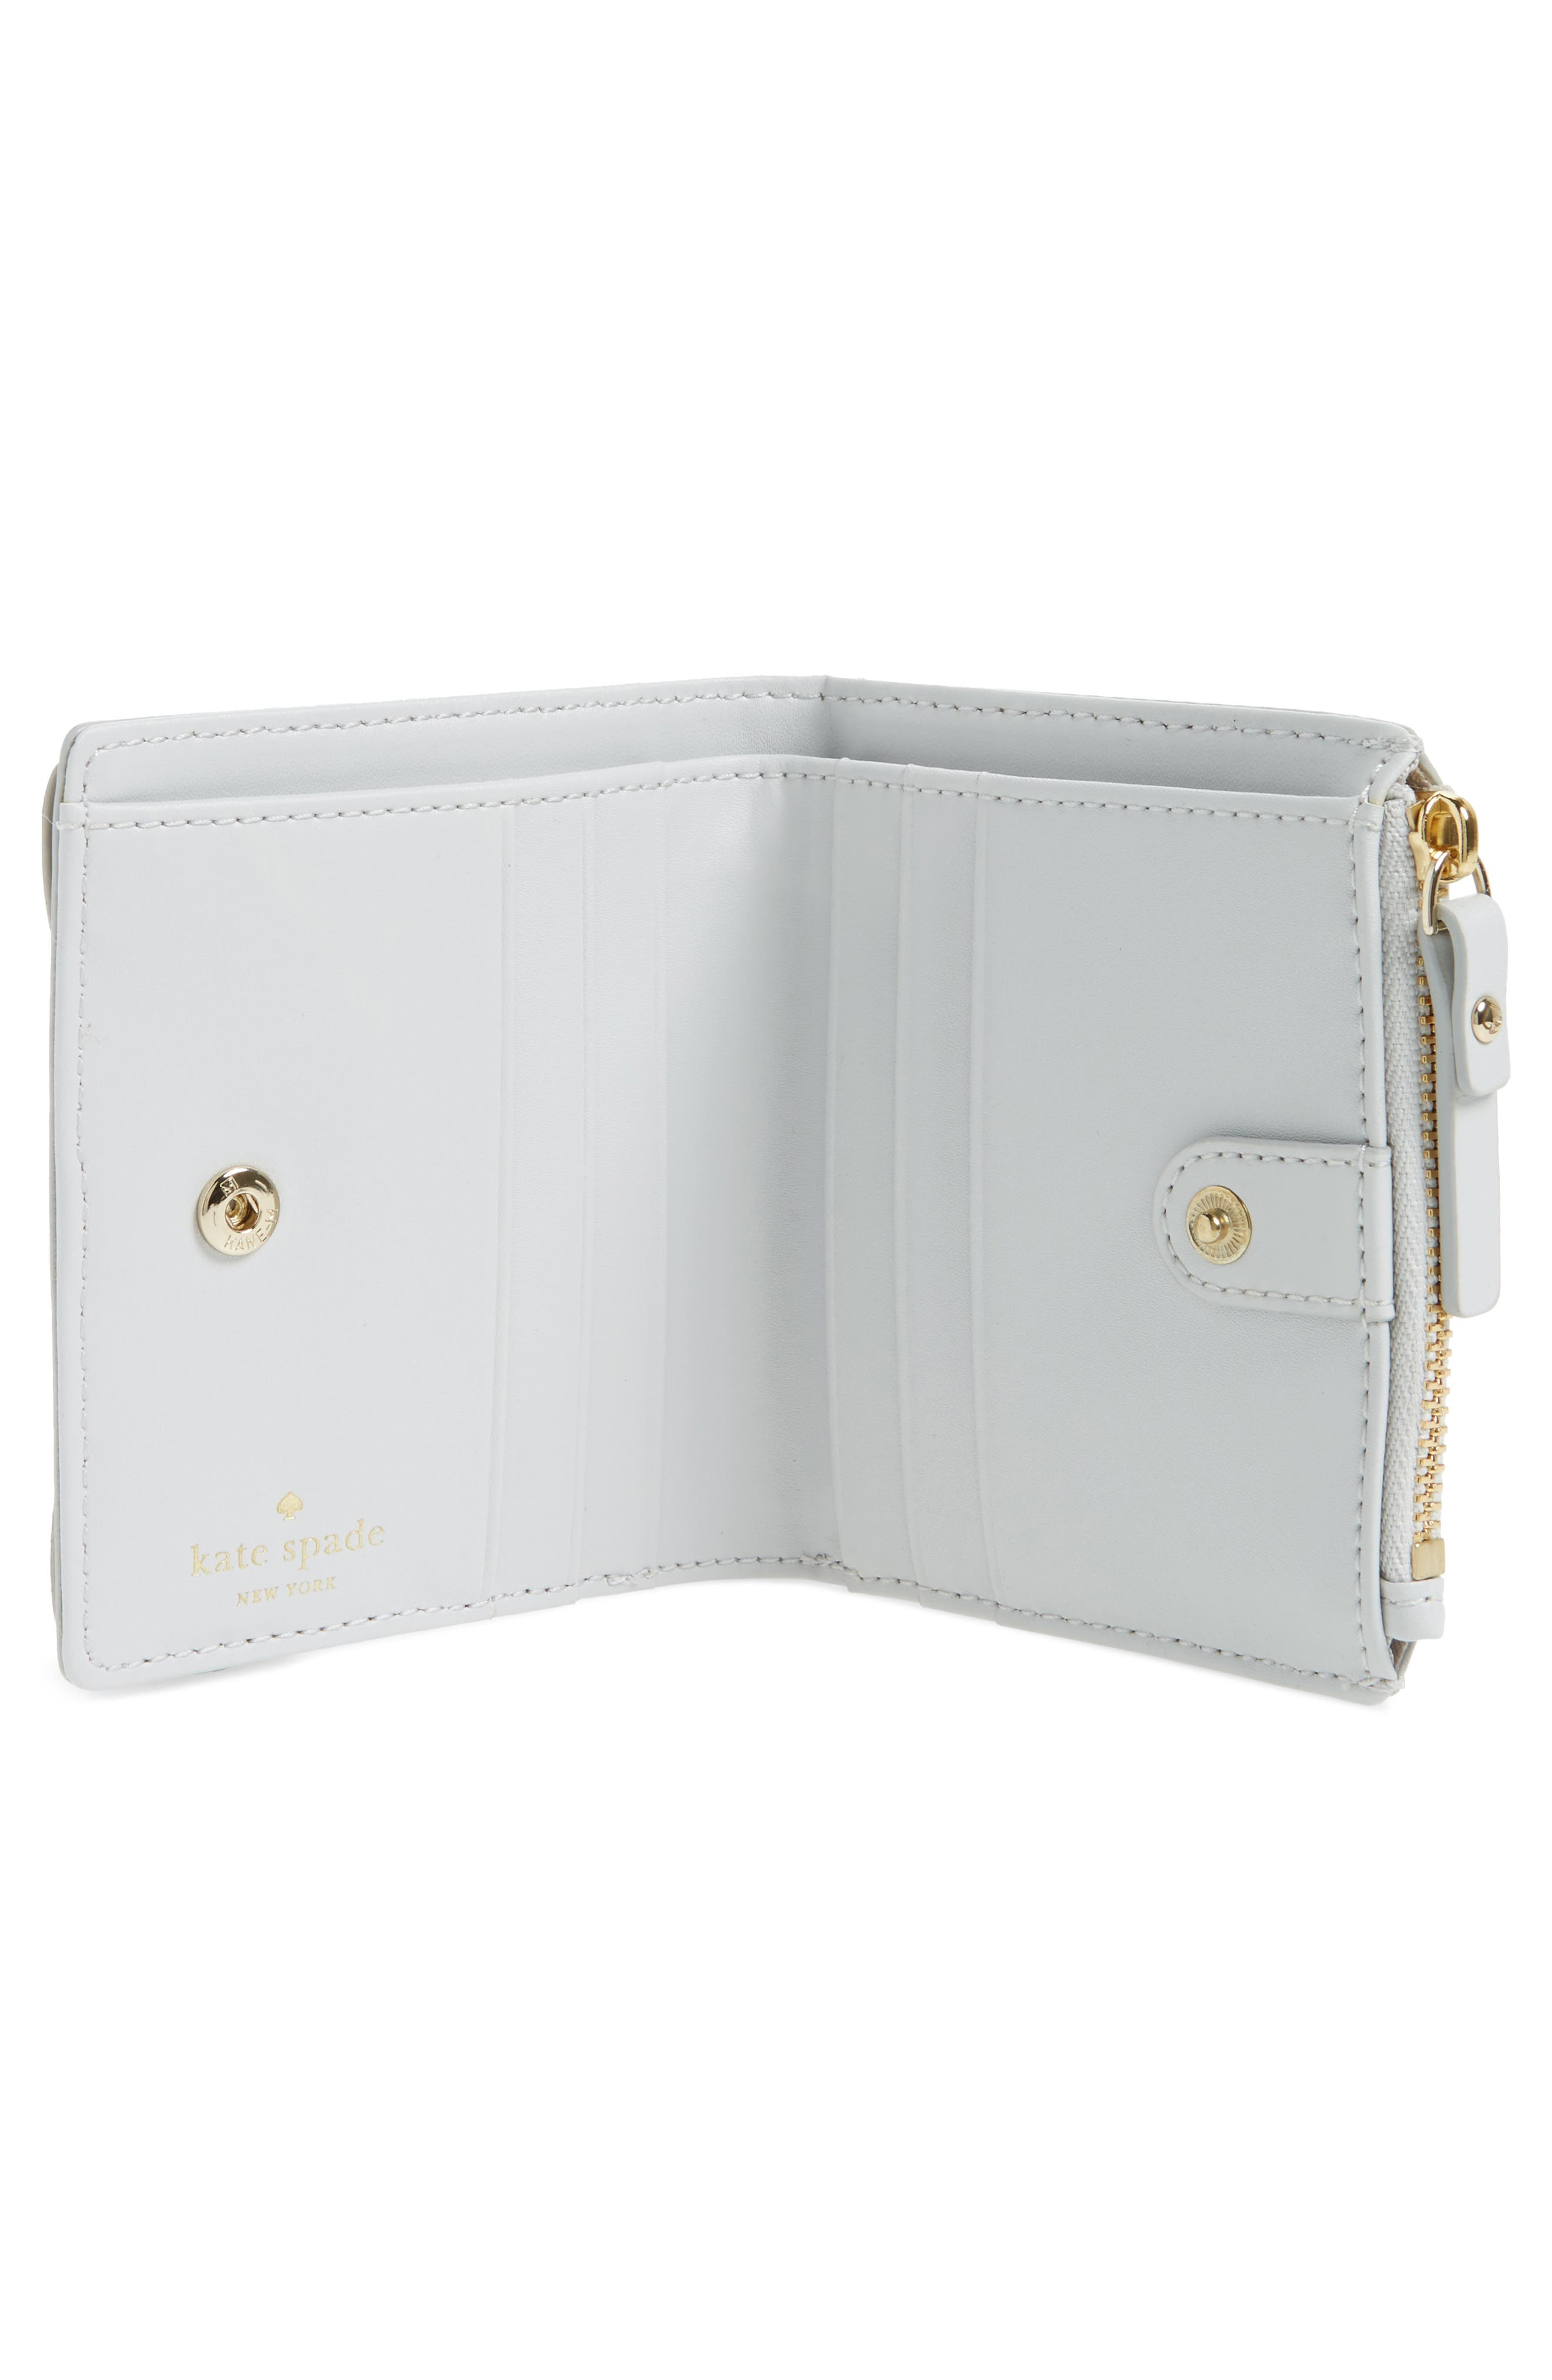 starbright owl adalyn leather card wallet,                             Alternate thumbnail 3, color,                             Multi